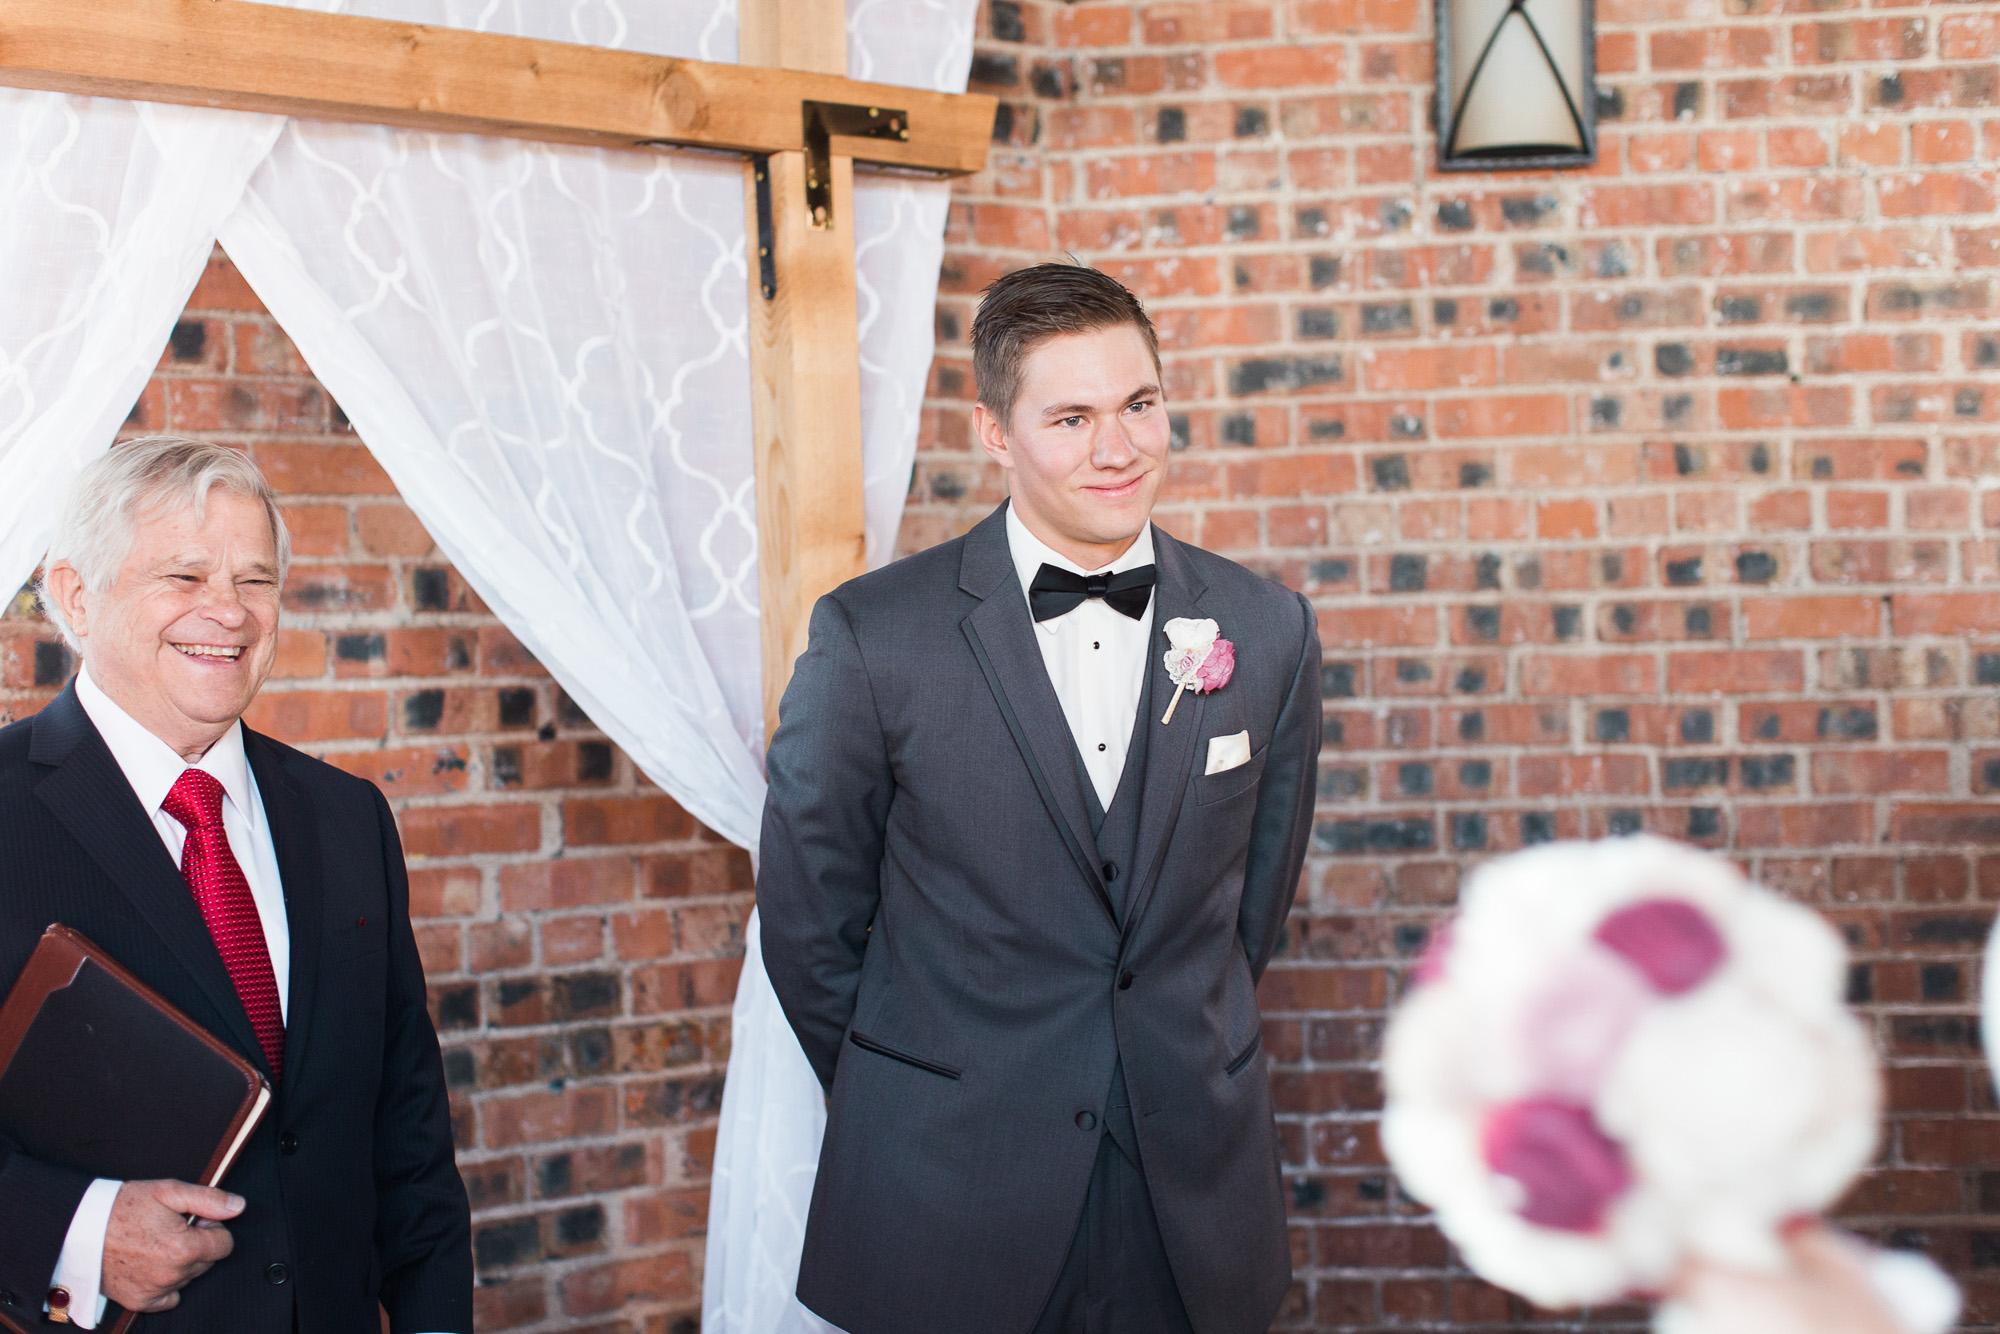 065aa-downtown-bryan-weddingdowntown-bryan-wedding.jpg